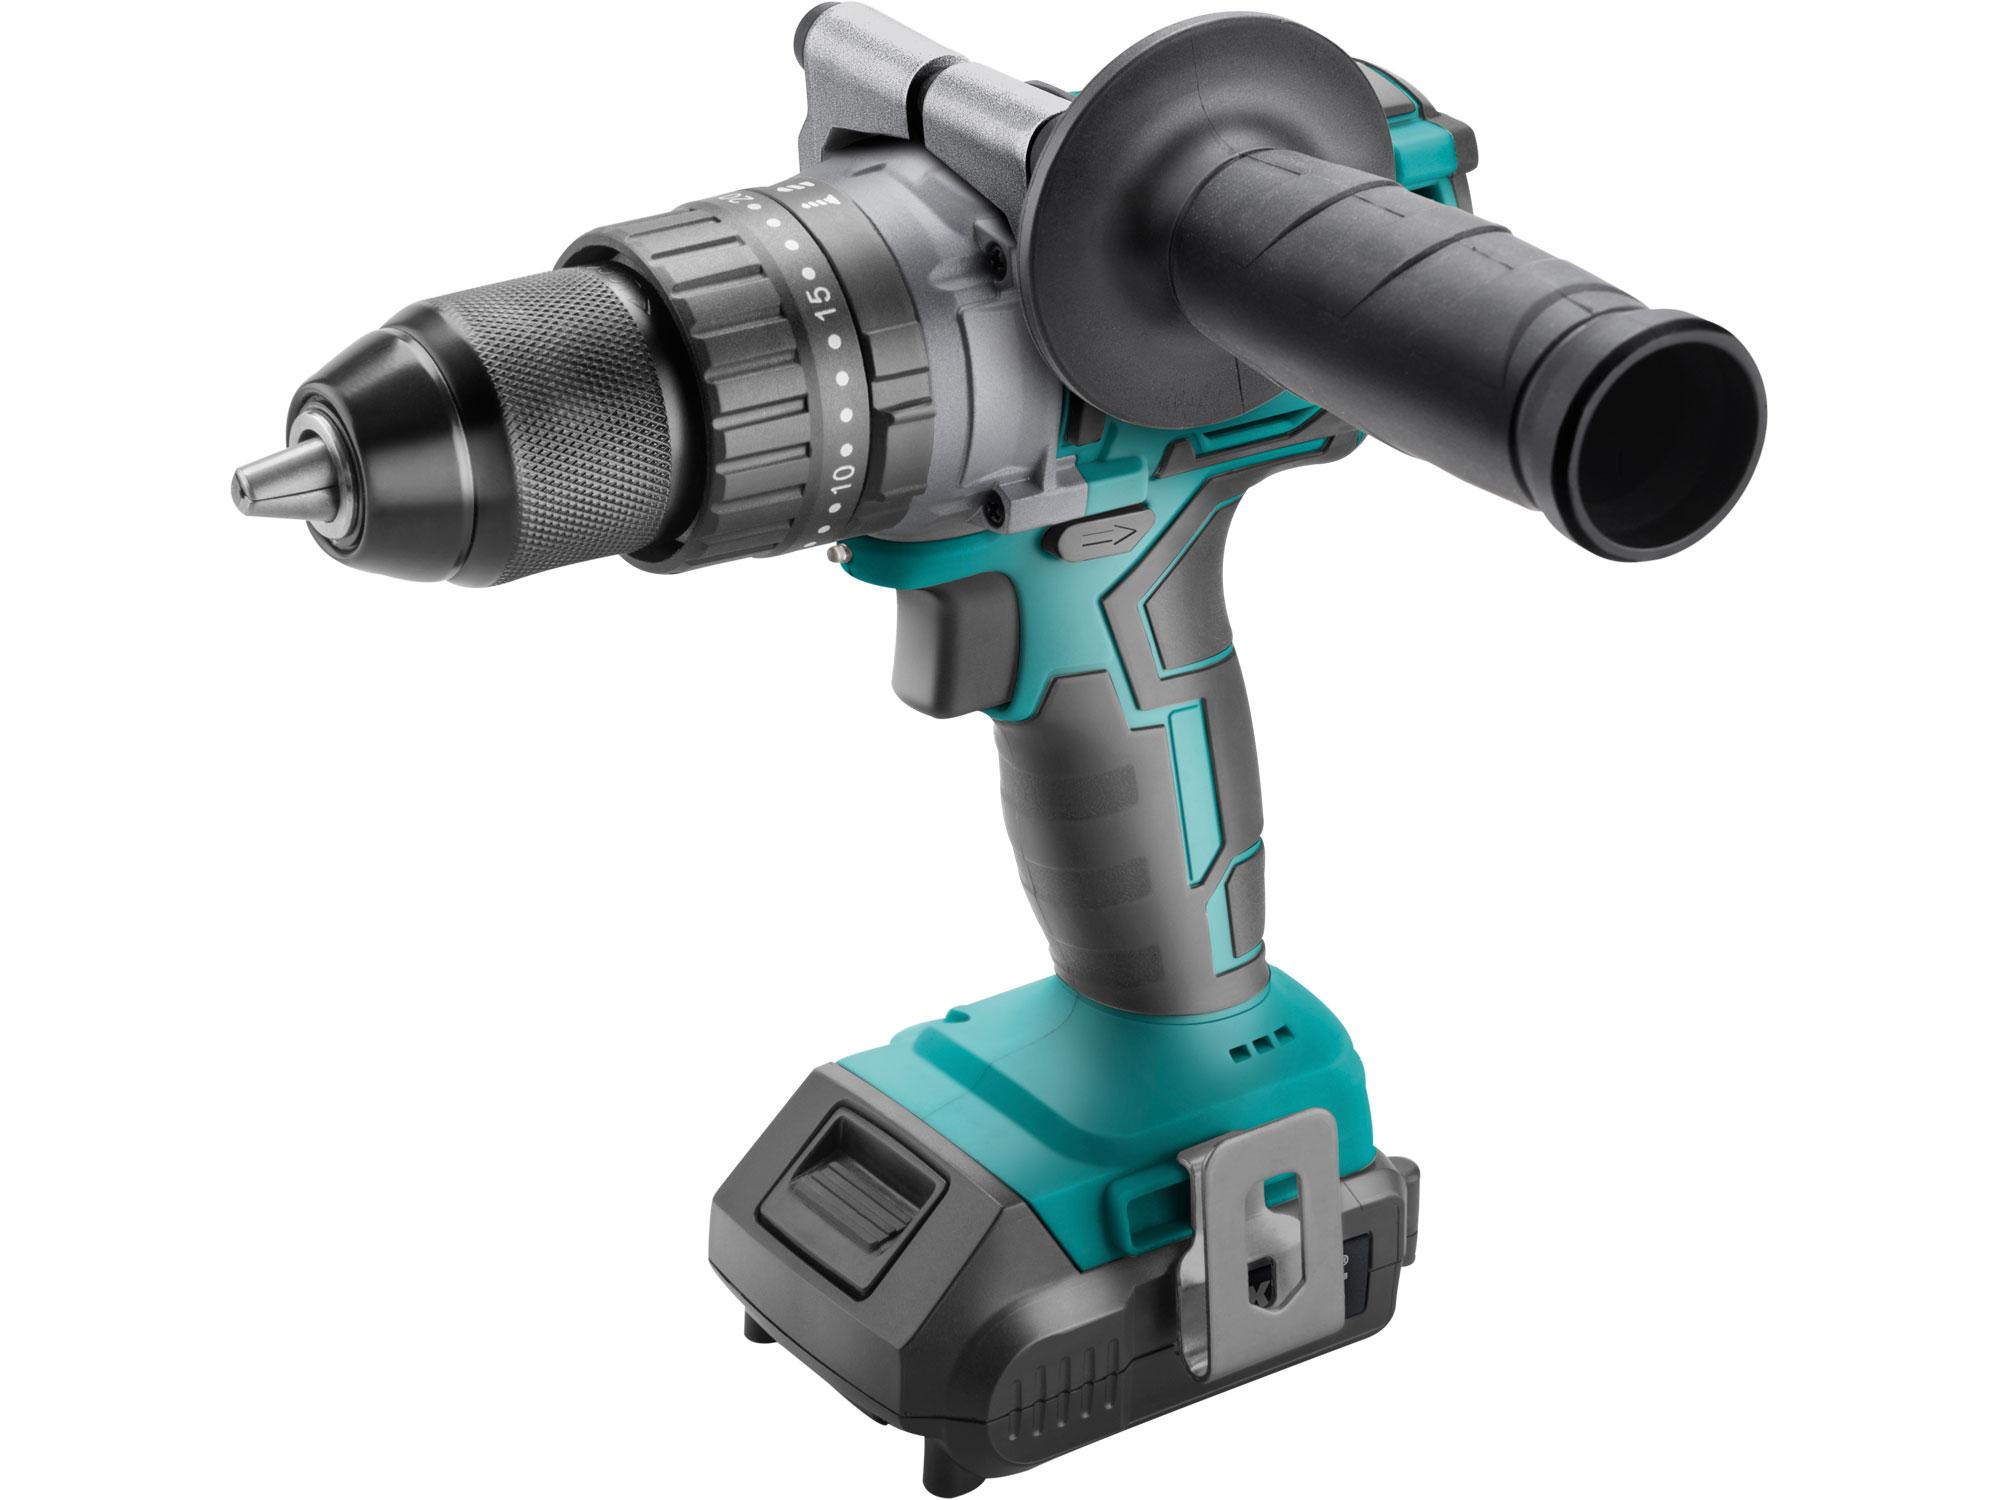 Cordless Hammer Drill with Brushless Motor 20V, 1x2000mAh